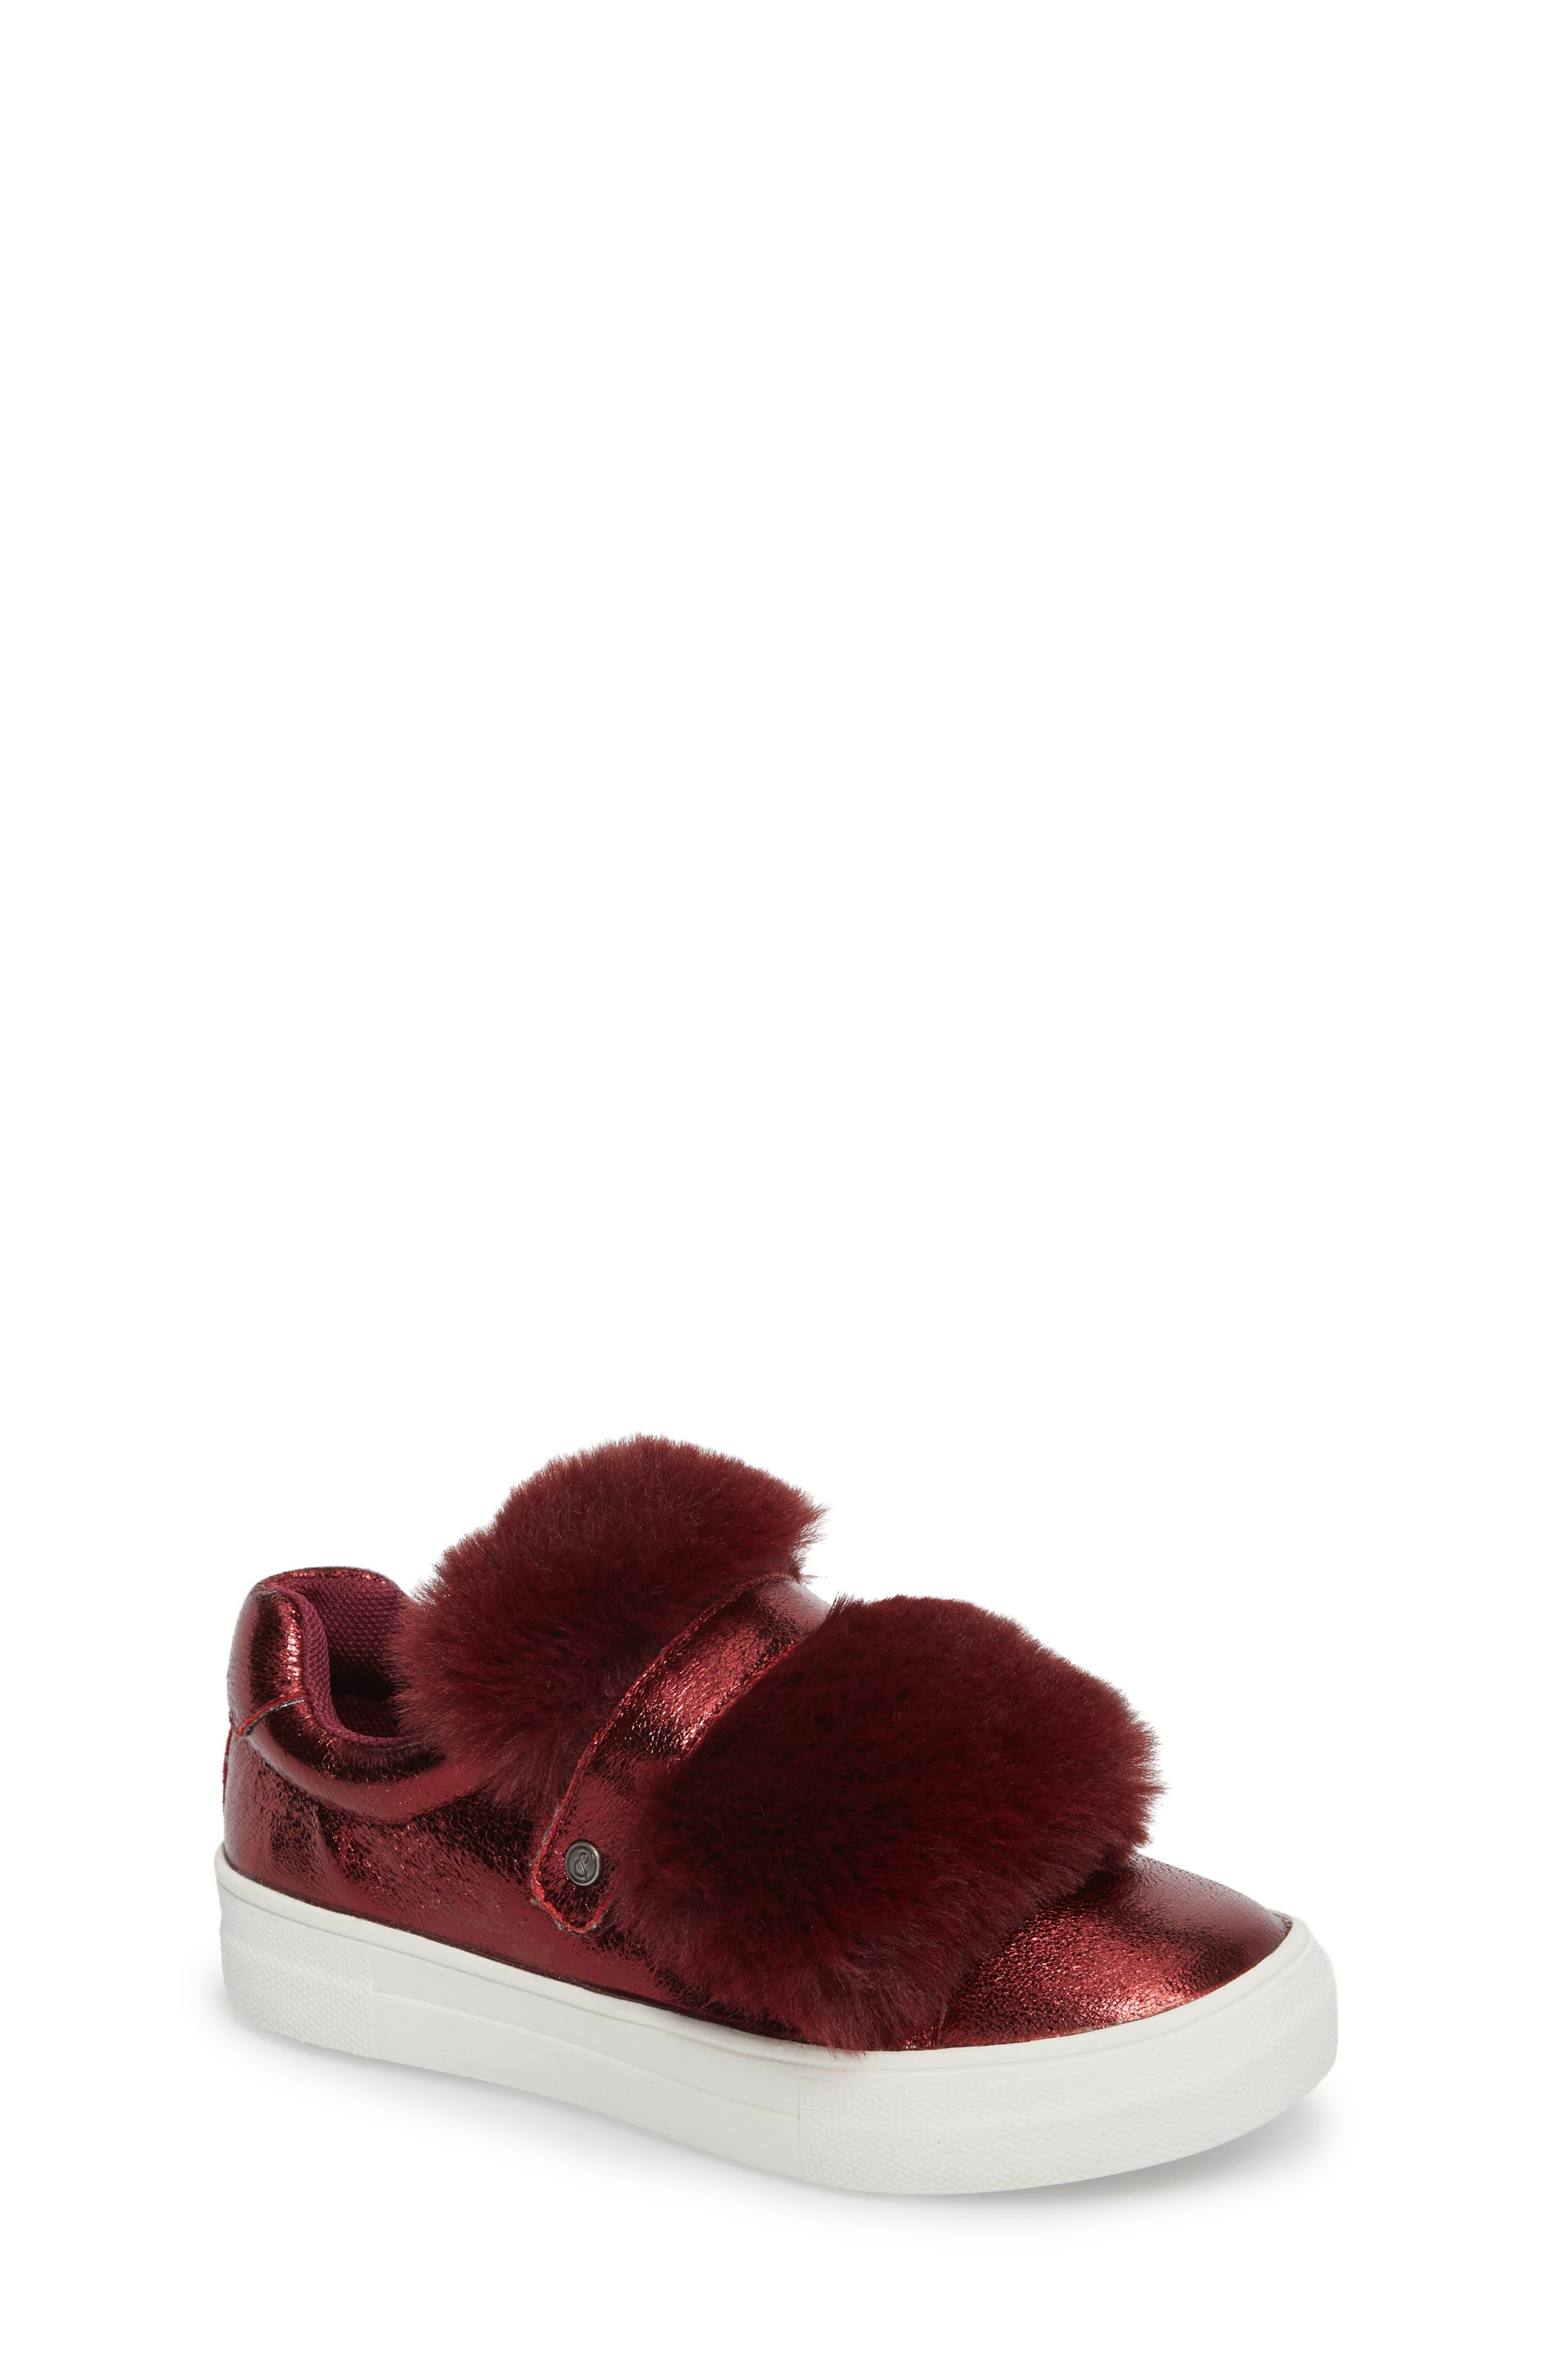 Zandra Faux Fur Metallic Sneaker,                         Main,                         color, 930